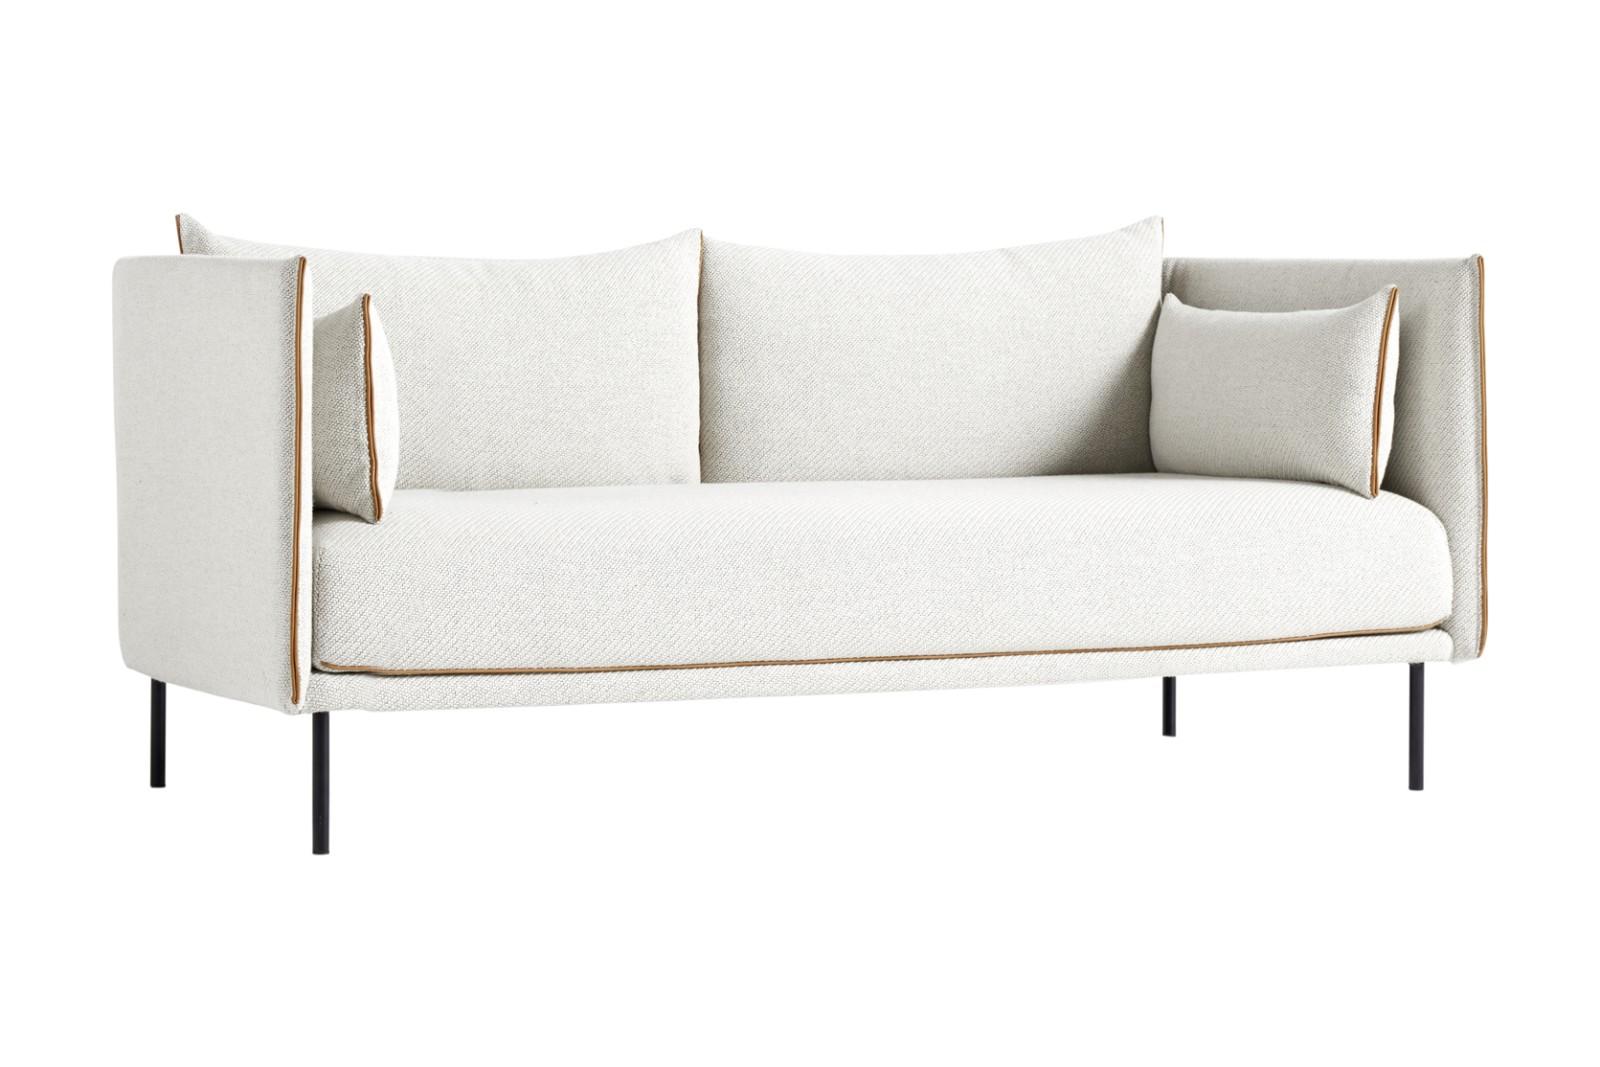 Silhouette 2 Seater Sofa Black Powder Coated Steel, Cognac Leather, Coda 2 100 thumbnail